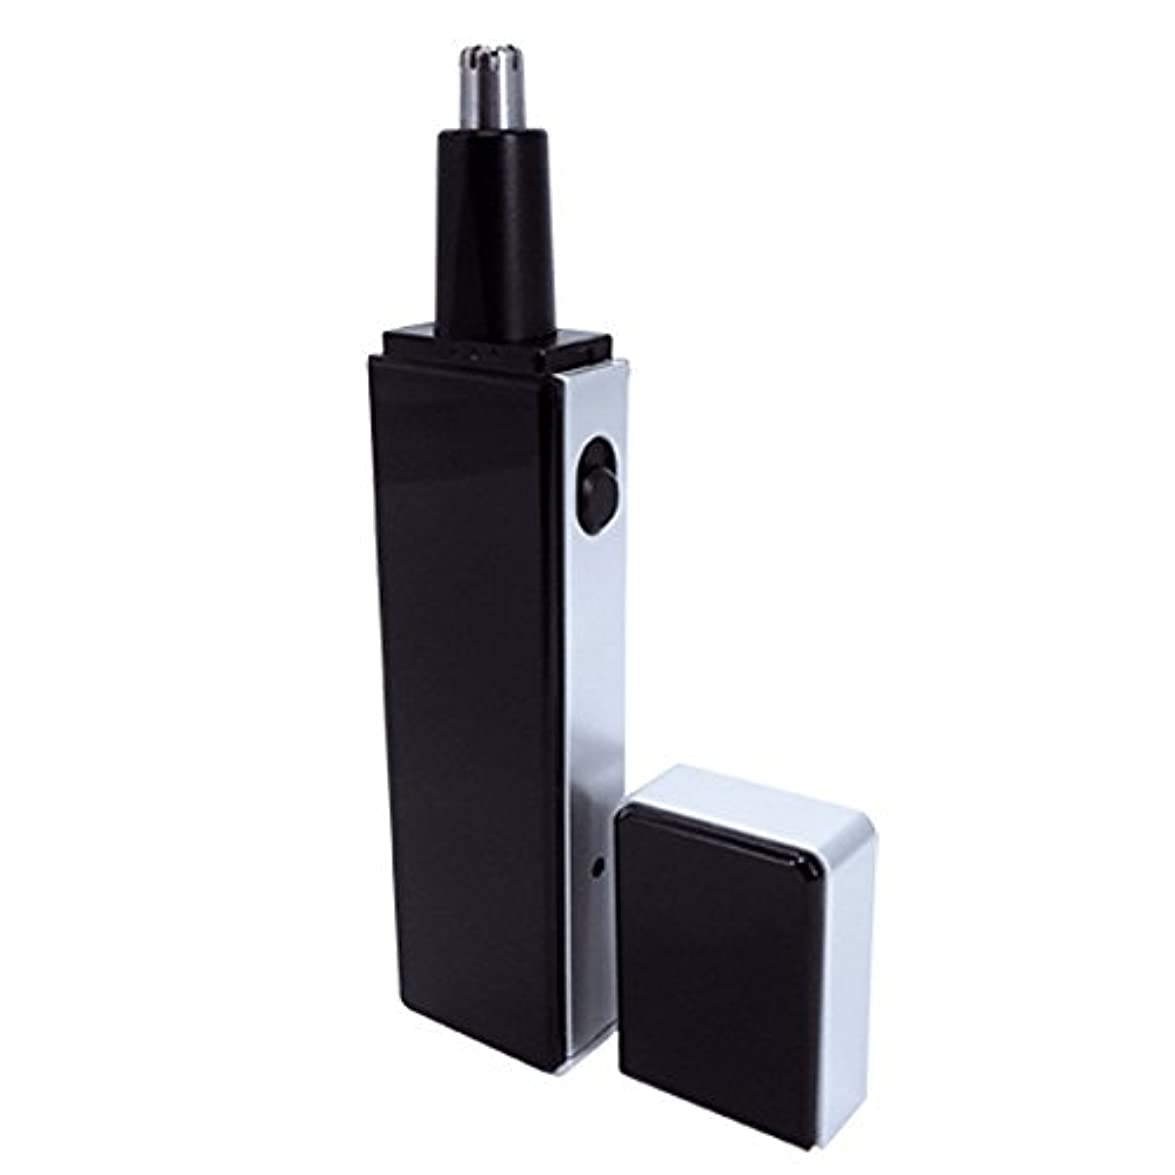 Slim Trimmer 充電式エチケットカッター / CNT299 / ###トリマーCNT299###